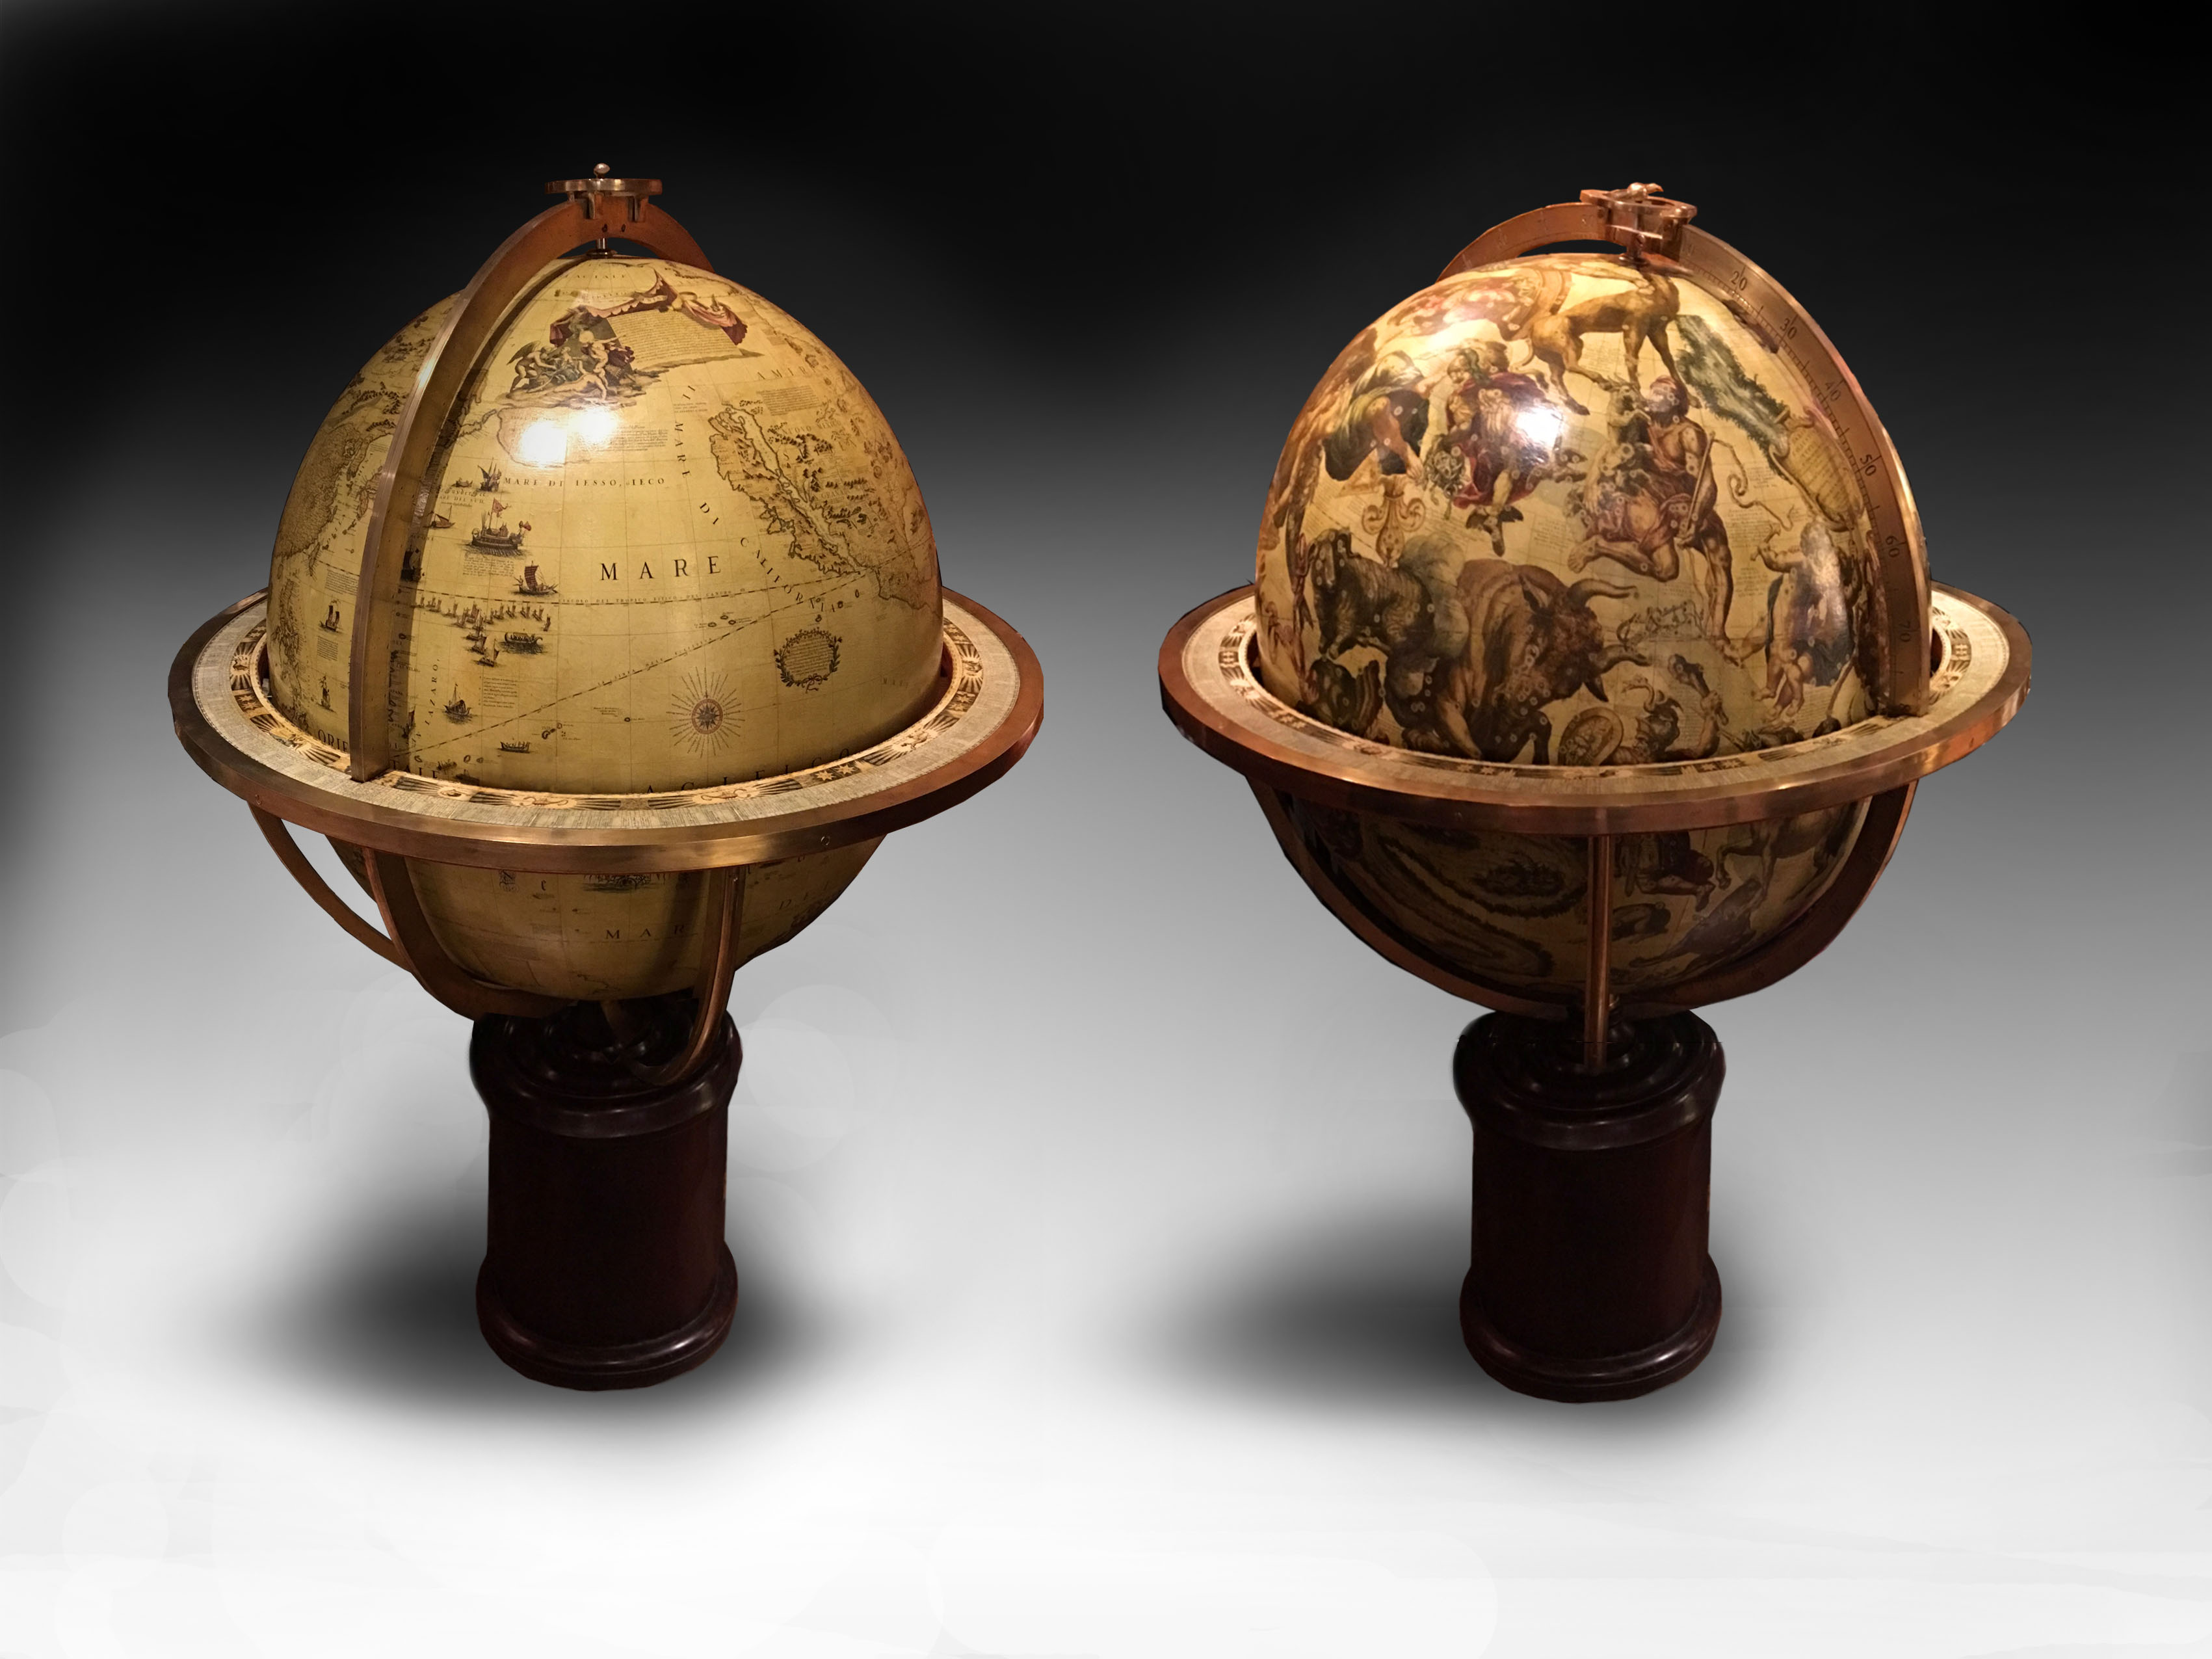 Coronelli, 'Terrestrial and Celestial Globes', 1688 & 1693. Photo: Globemakers.com